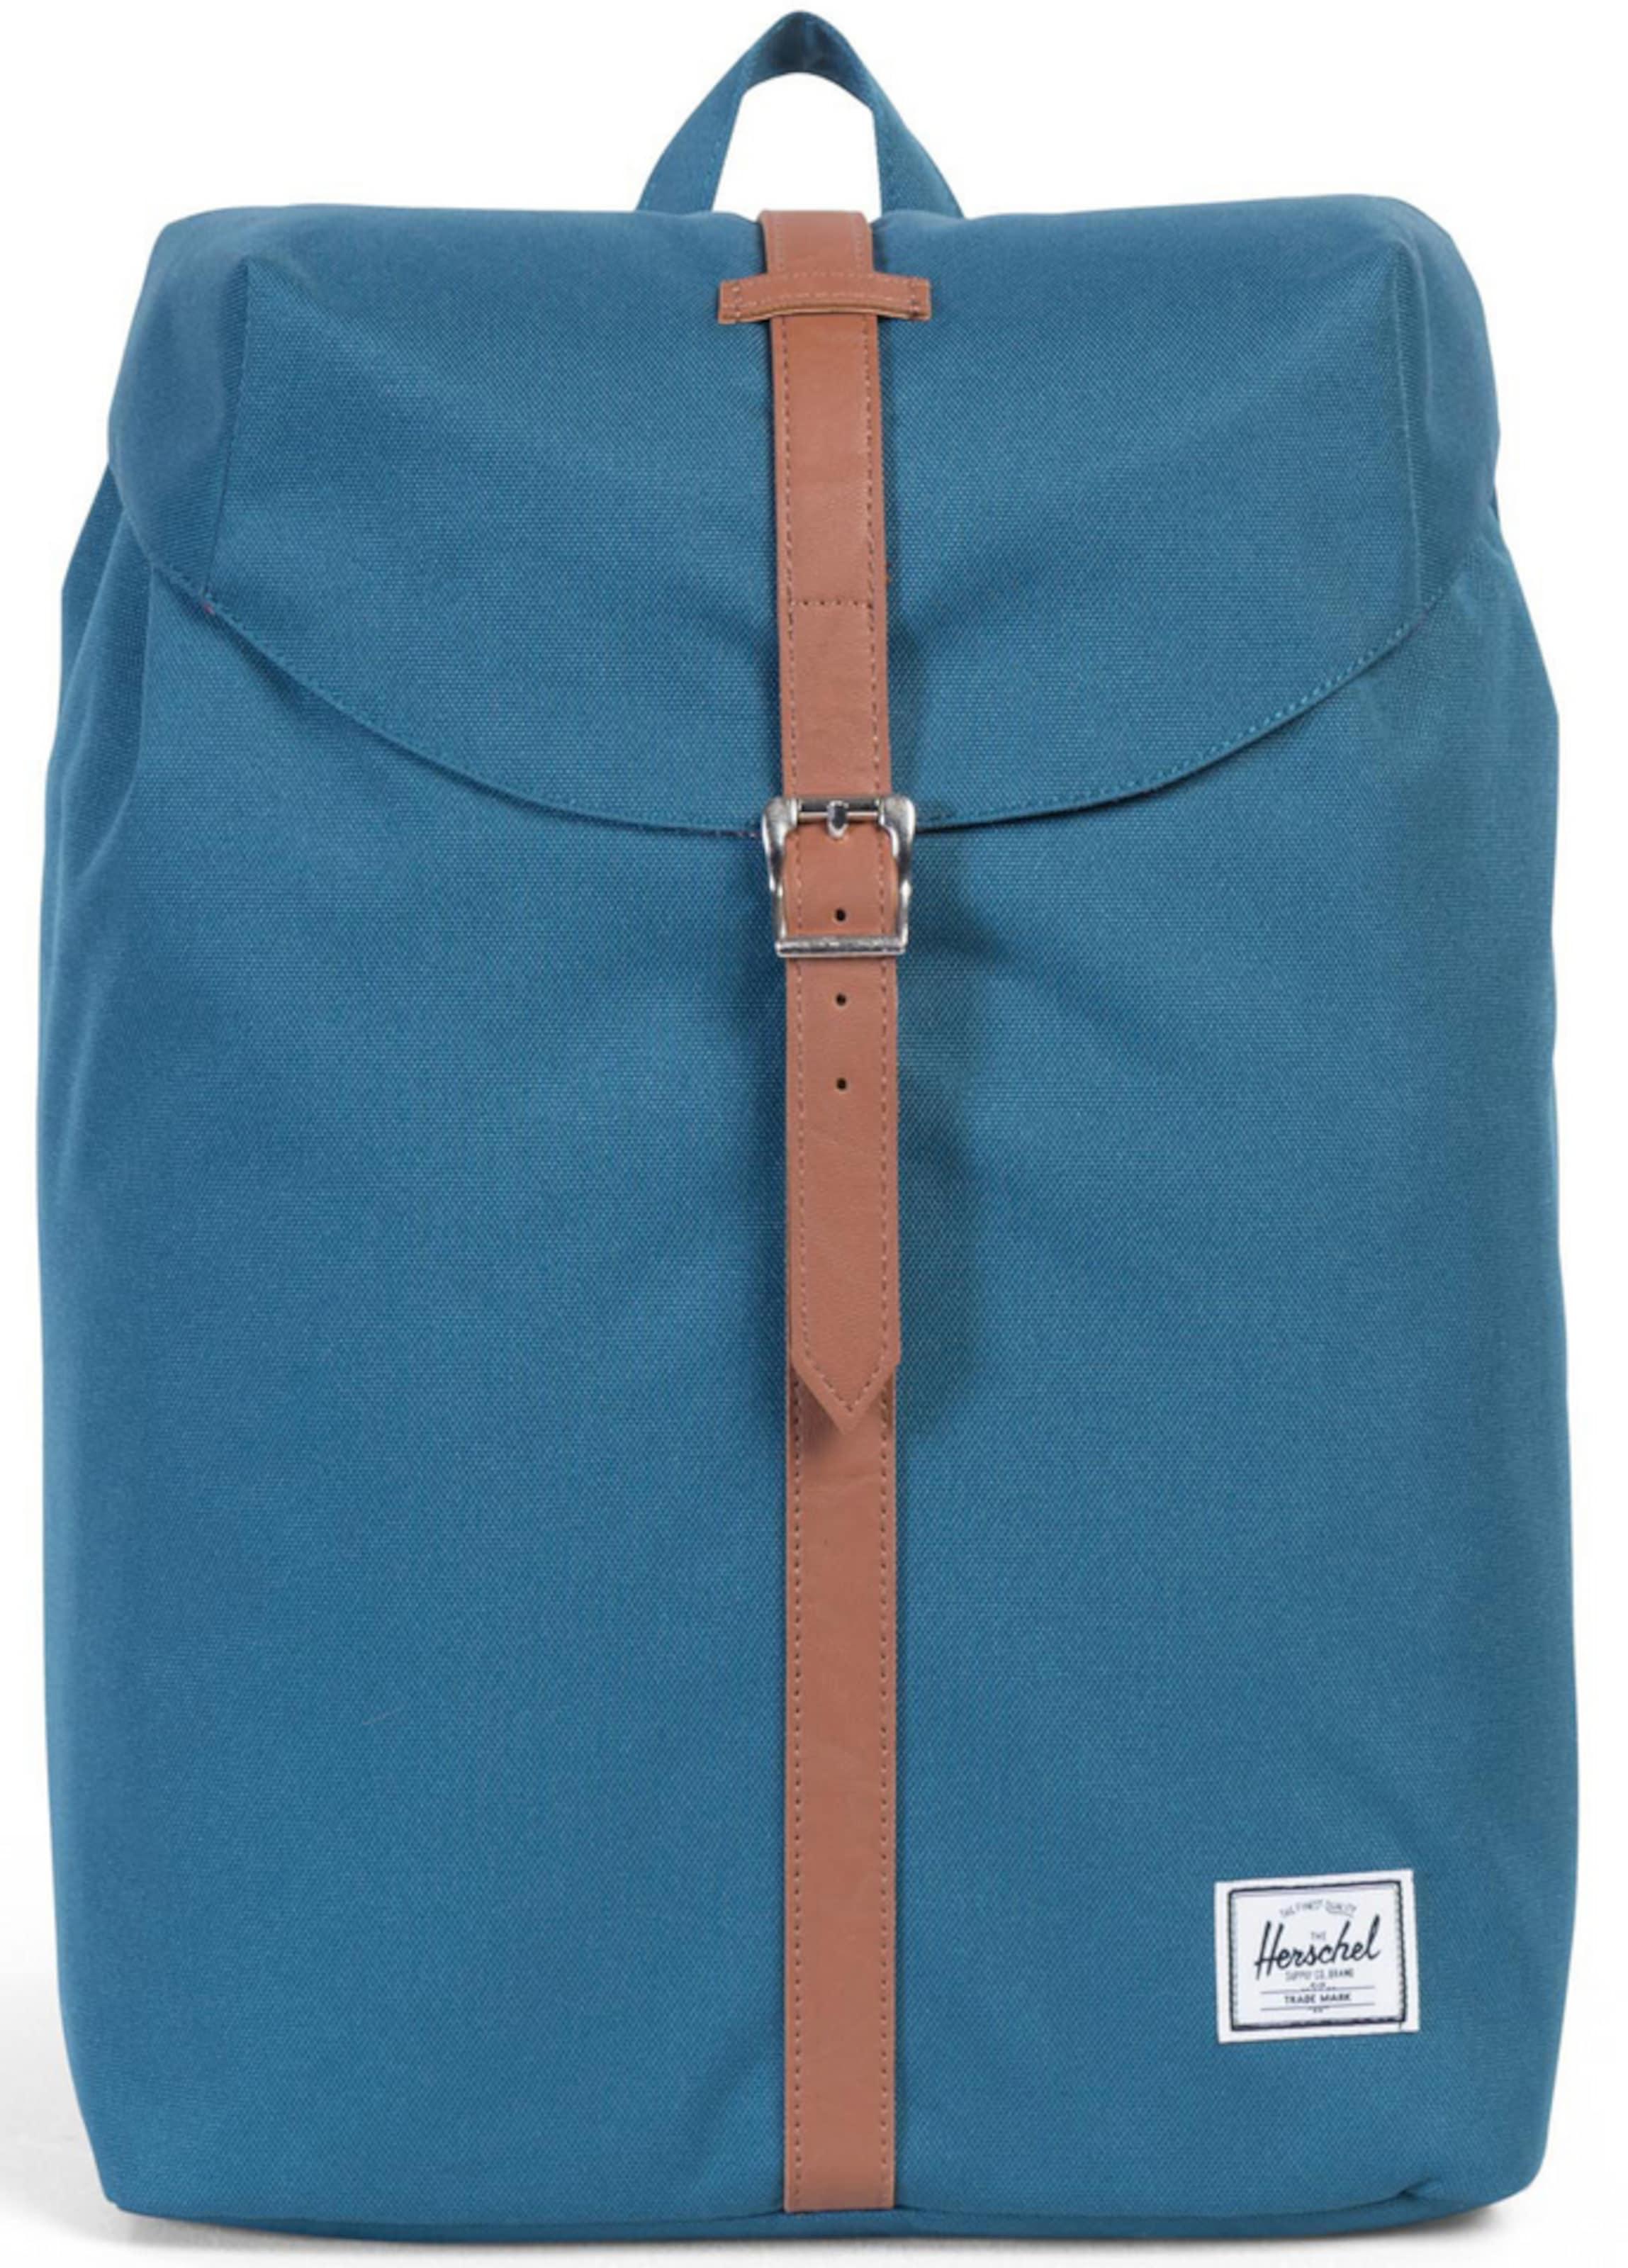 Herschel Rucksack mit Laptopfach 'Post Backpack, Indian Teal, Mid Volume'